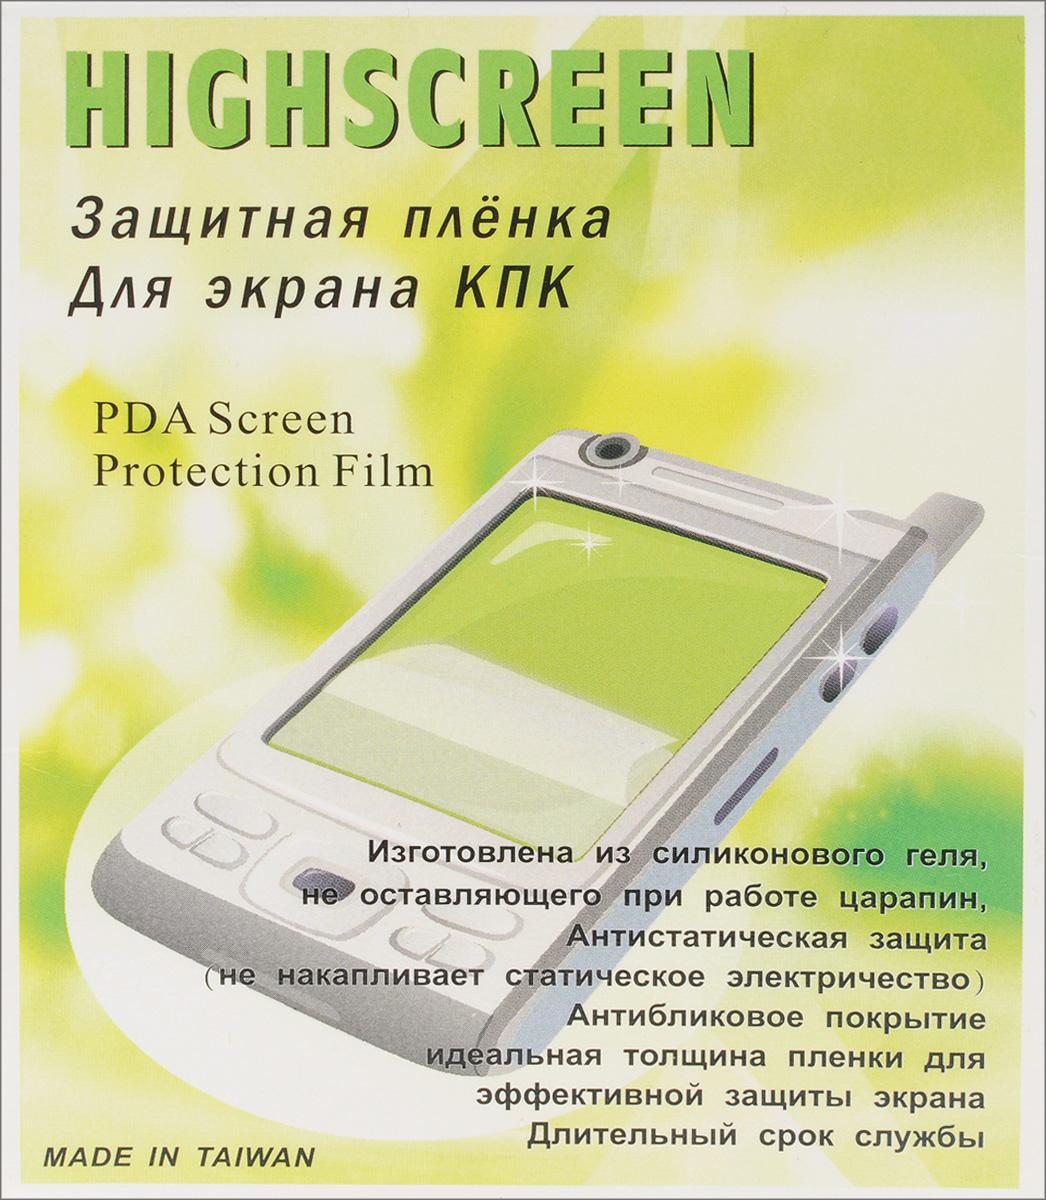 Highscreen универсальная защитная пленка для экрана 2,7